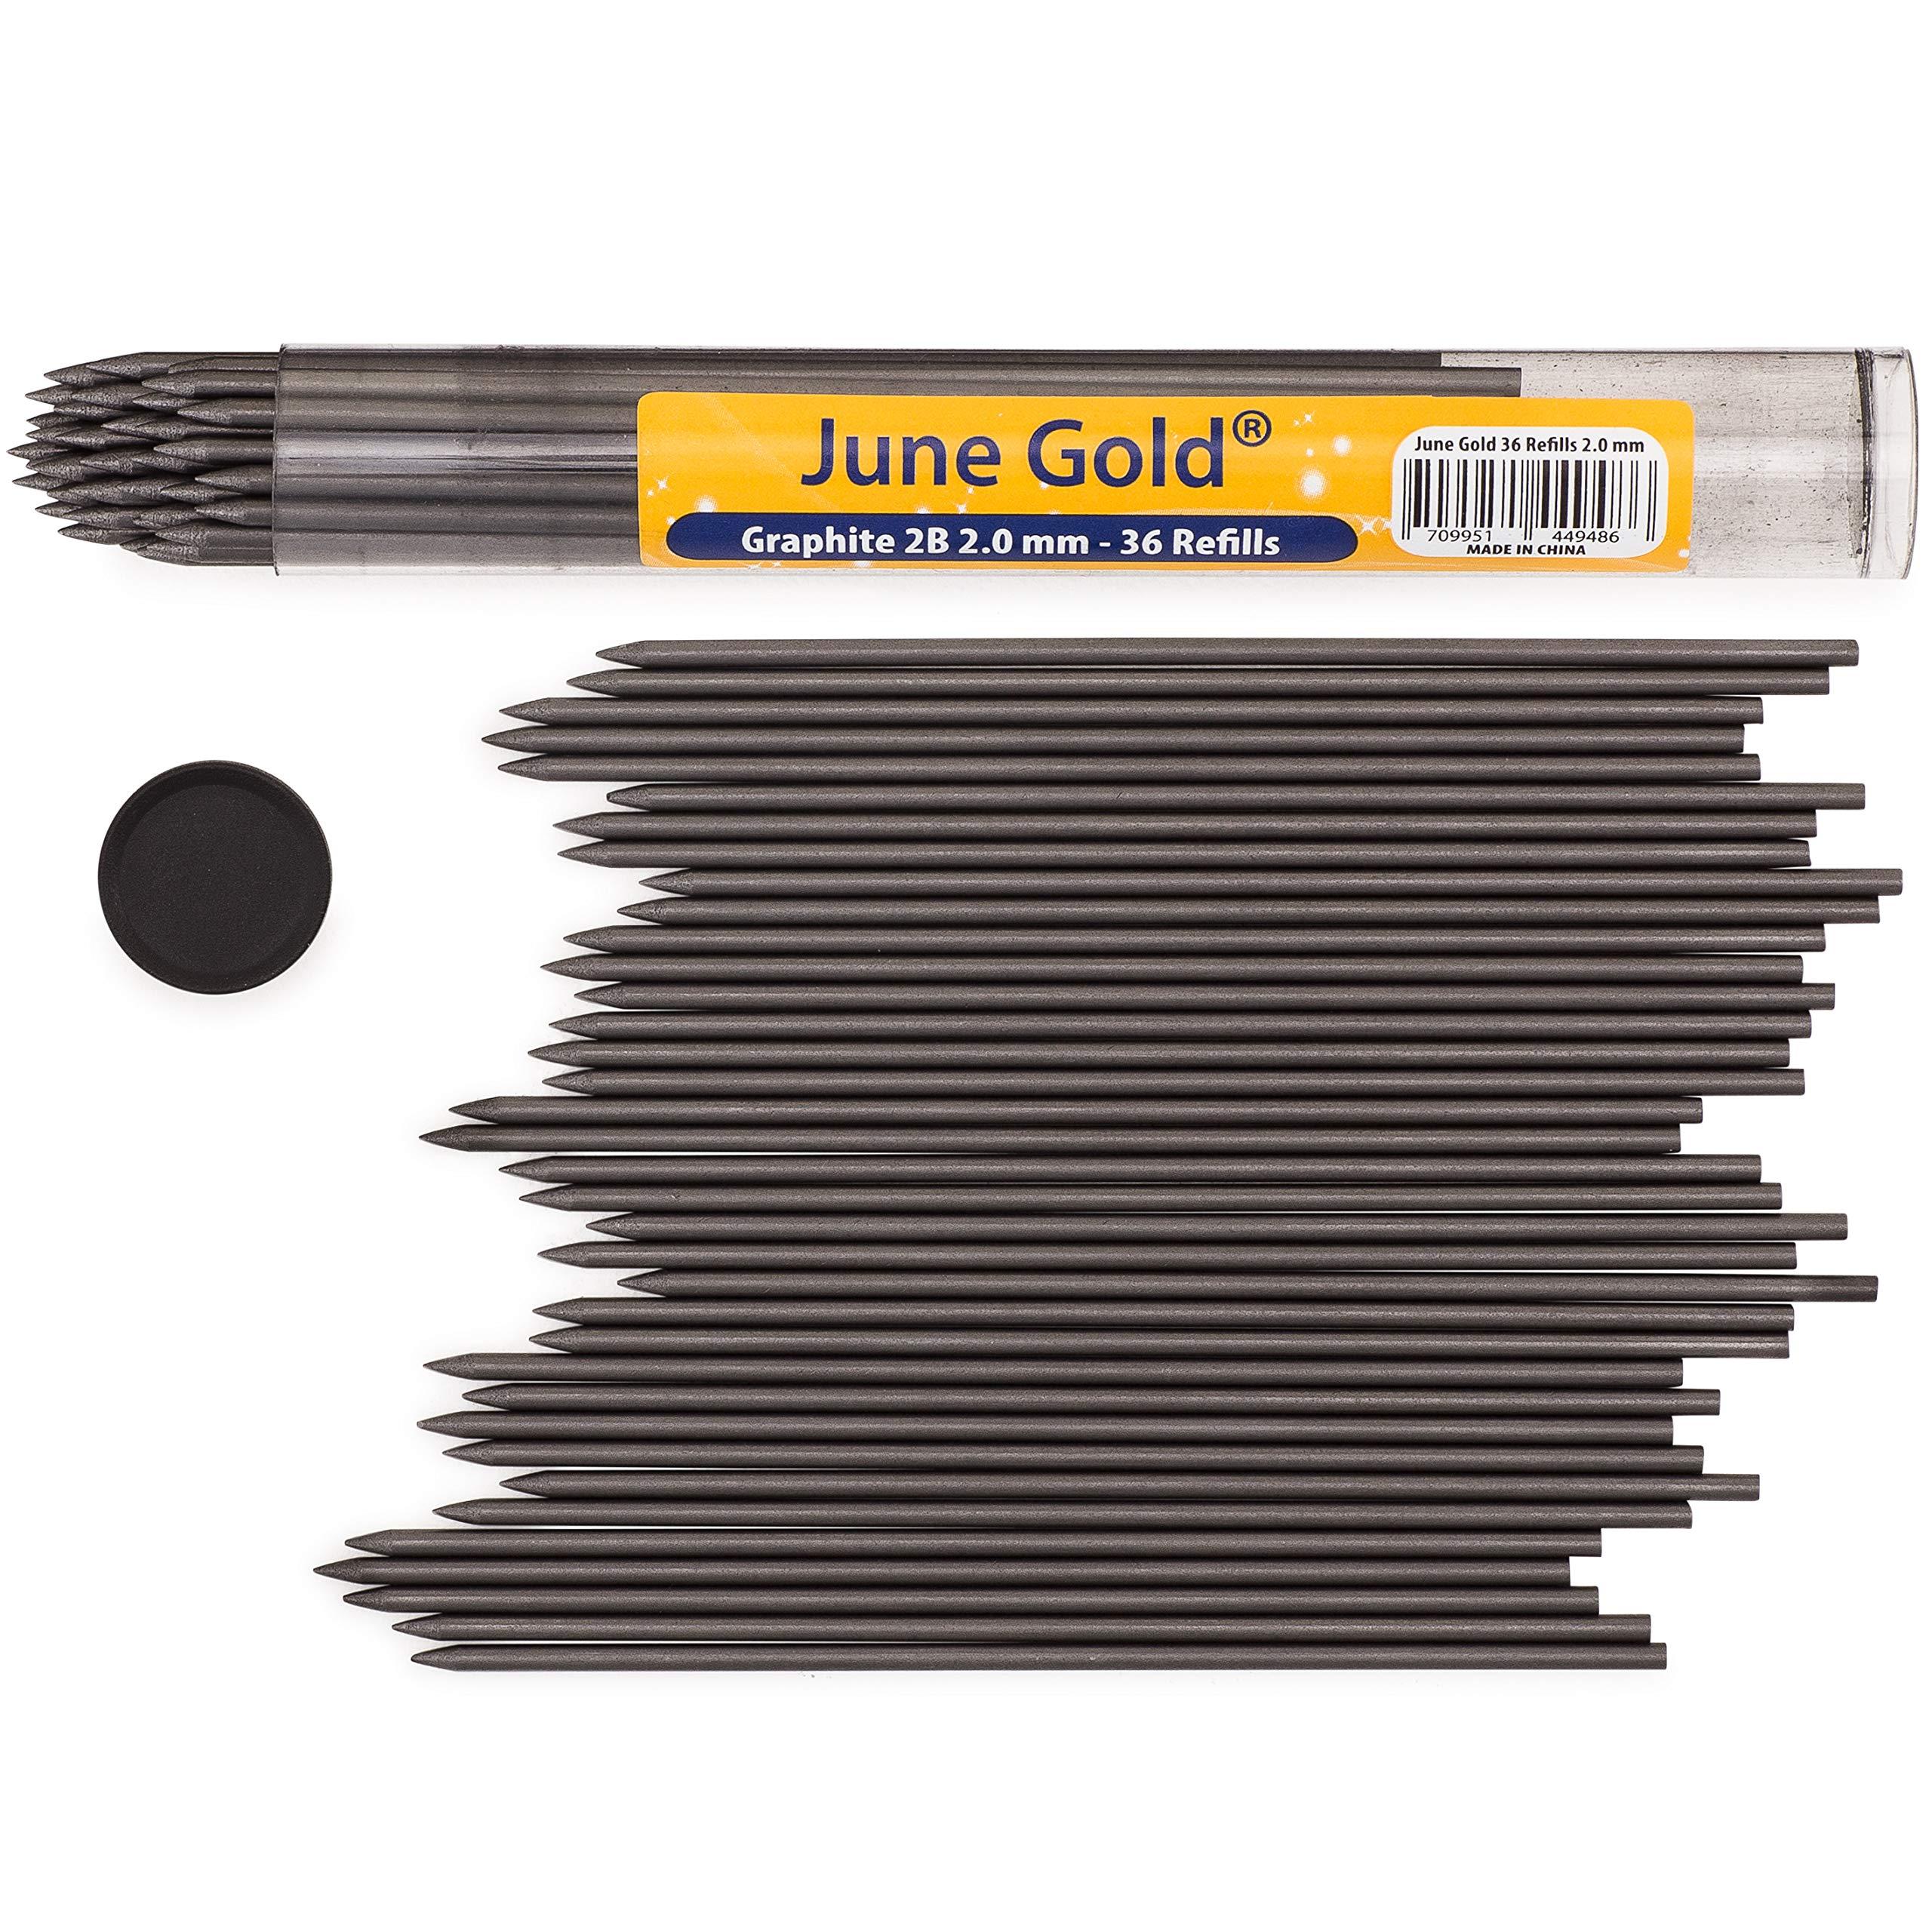 SNNplapla 12pcs 5.6MM HB//2B//4B//6B//8B Mechanical Leads Auto Clutch Pencil Holder Refills 2B 2pcs